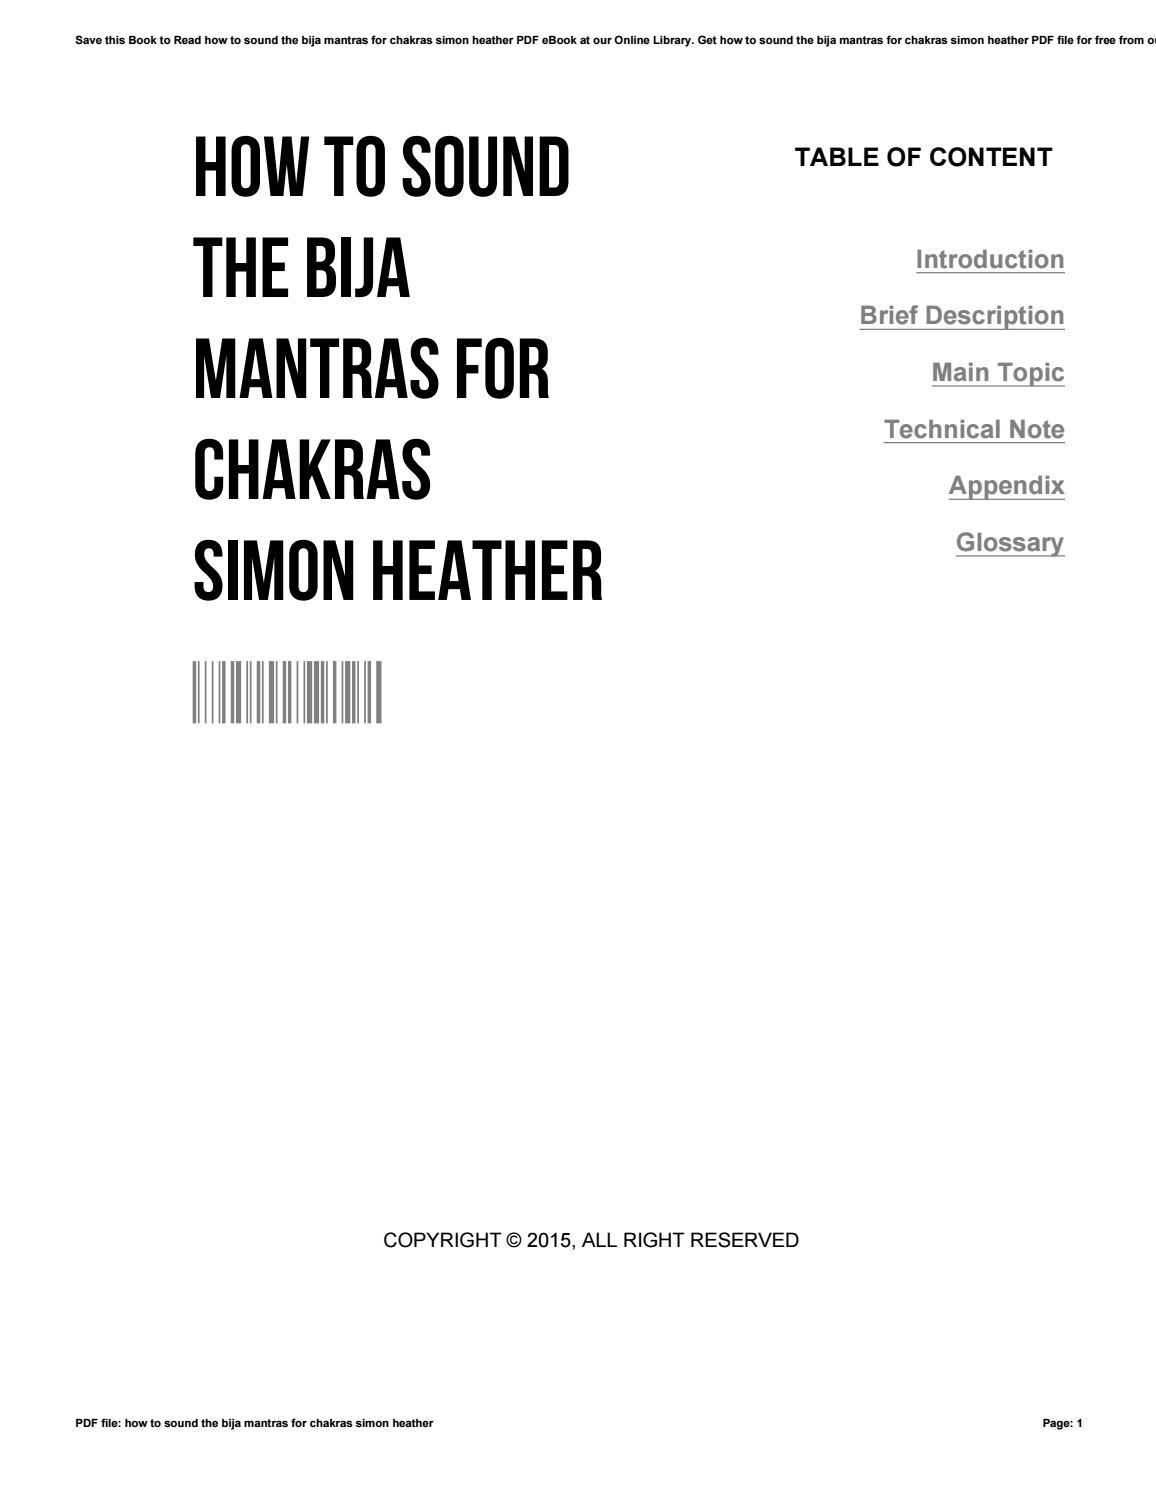 How to sound the bija mantras for chakras simon heather by